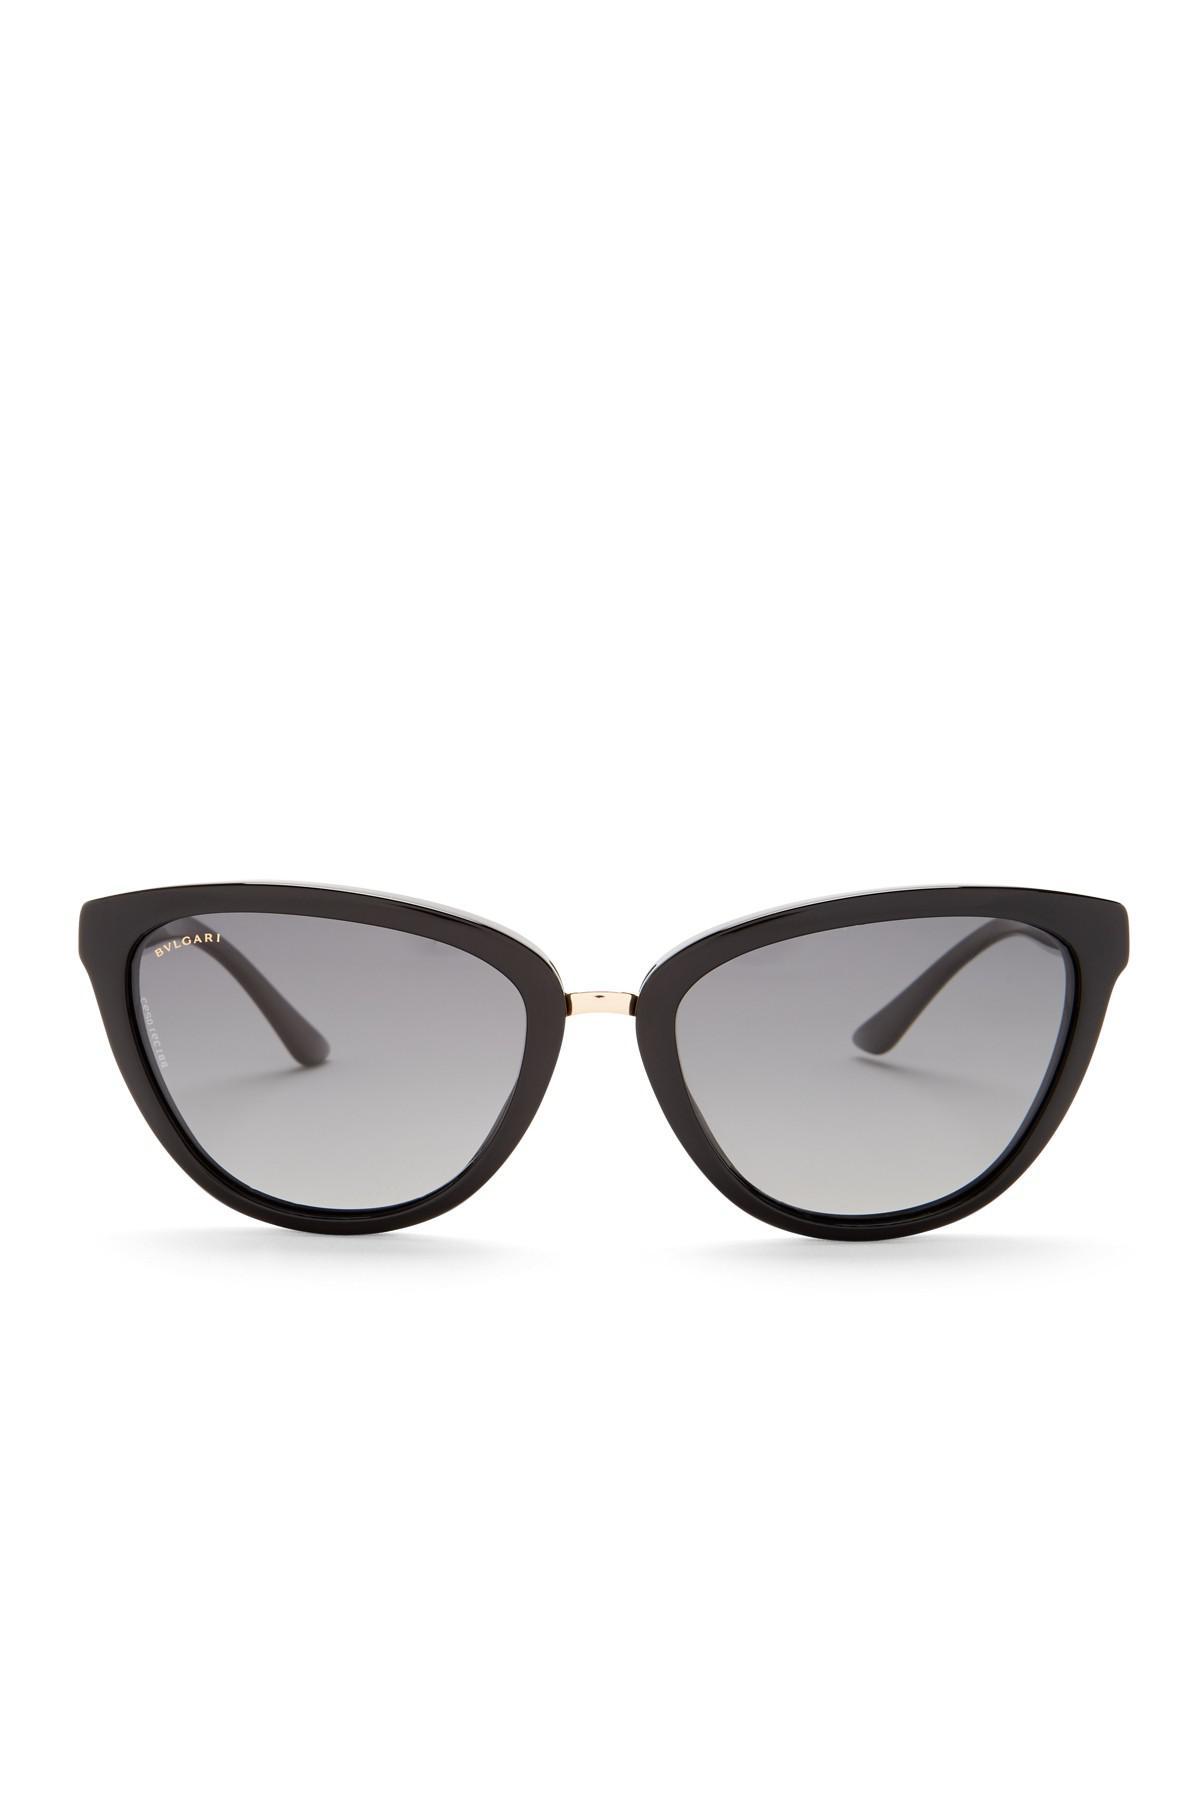 8abff48838bf7 Lyst - Bvlgari Women s Cat Eye Sunglasses in Black